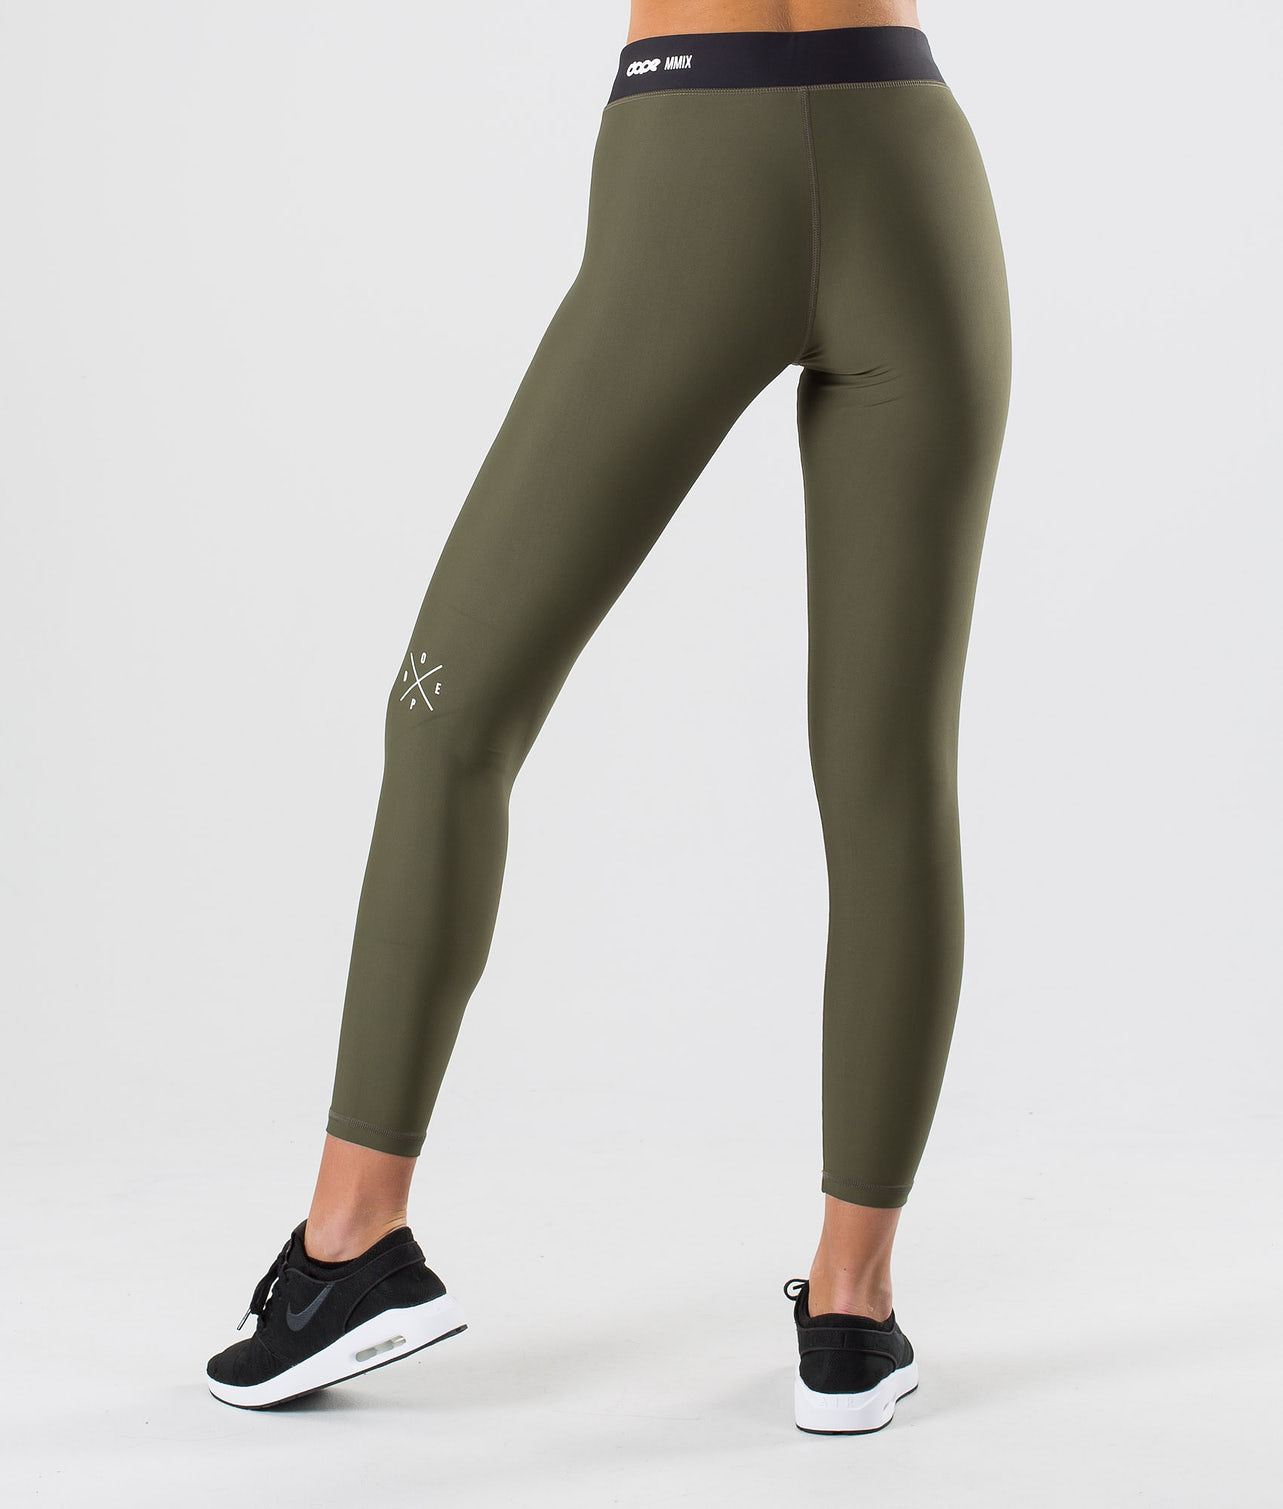 Dope Razor Leggings Green